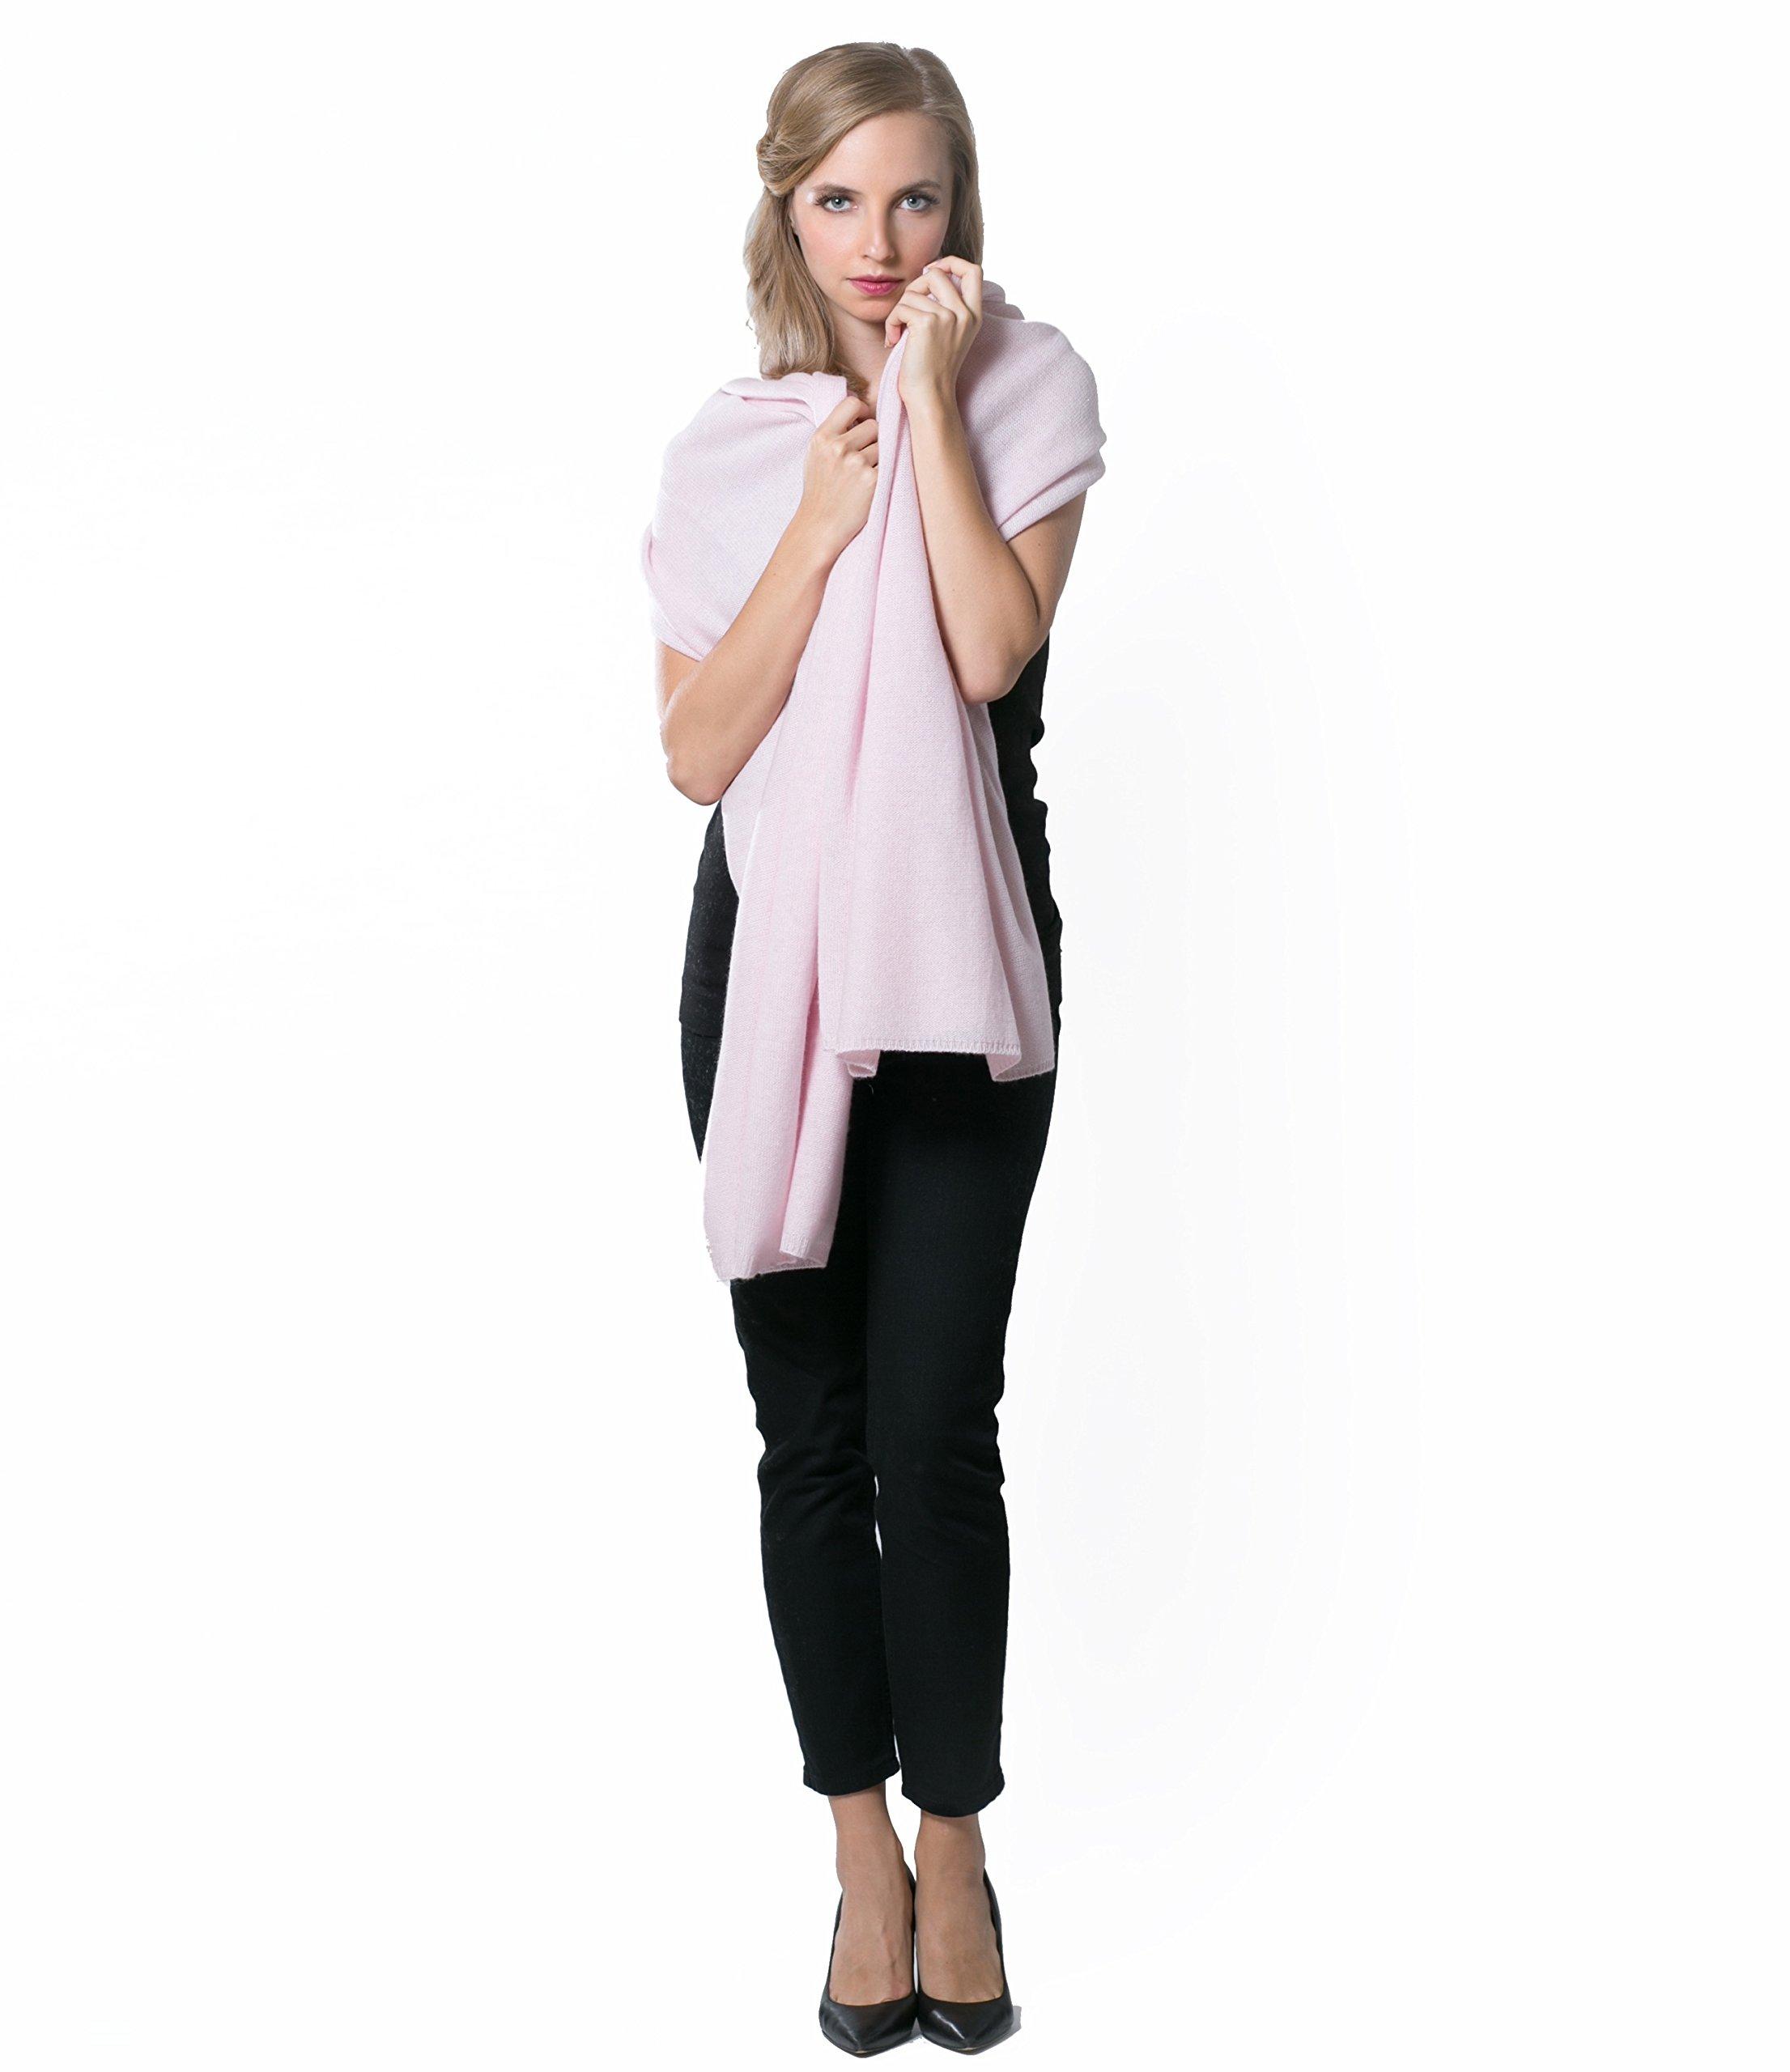 Super Soft Oversized 100% Cashmere Travel Blanket Scarf Wrap - Soft Pink by Anna Kristine